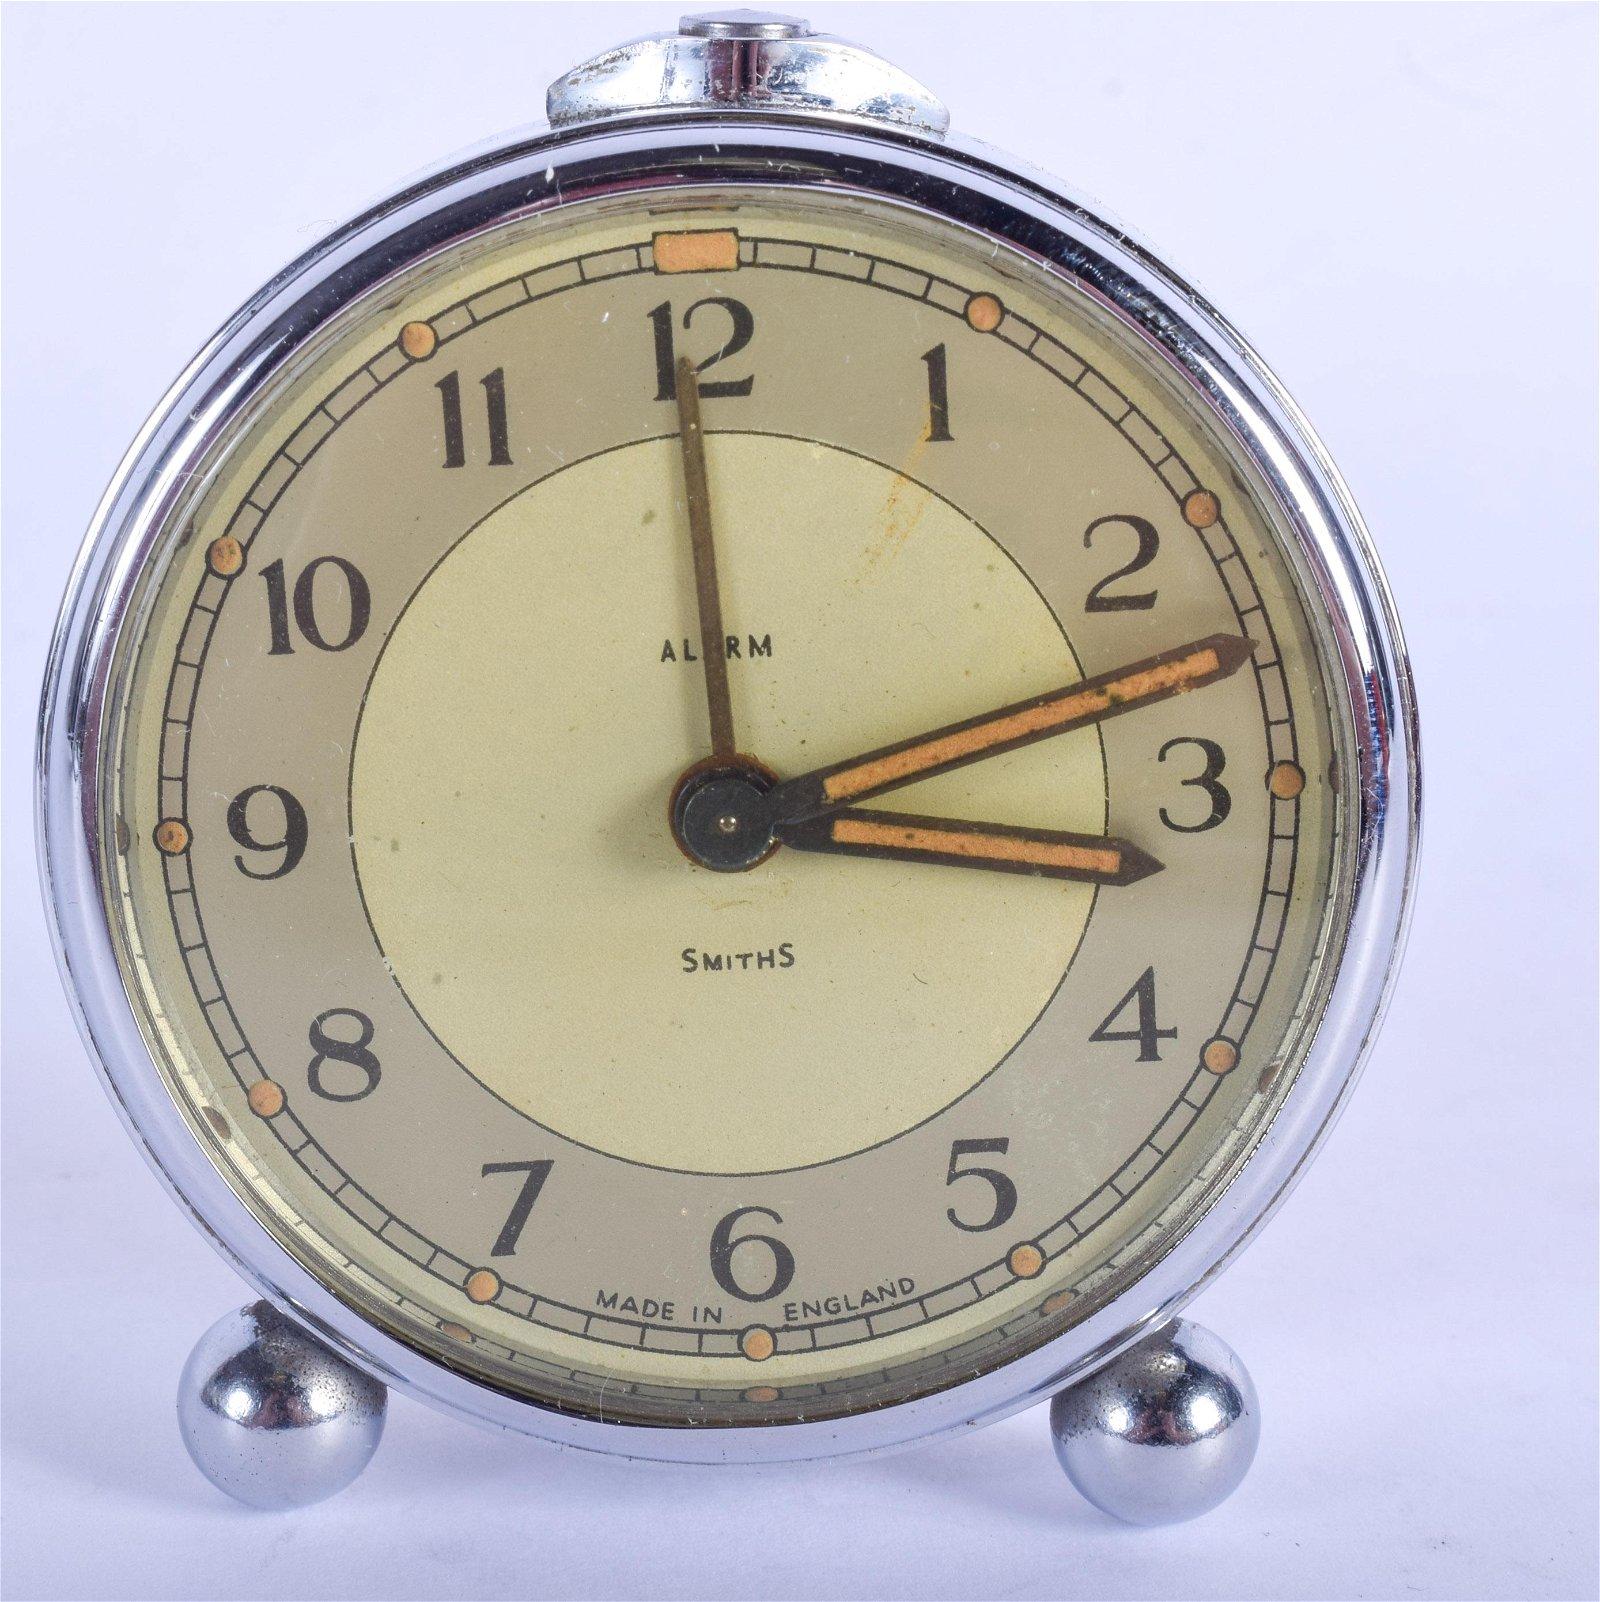 A SMITHS ALARM CLOCK. 5.5 cm wide.